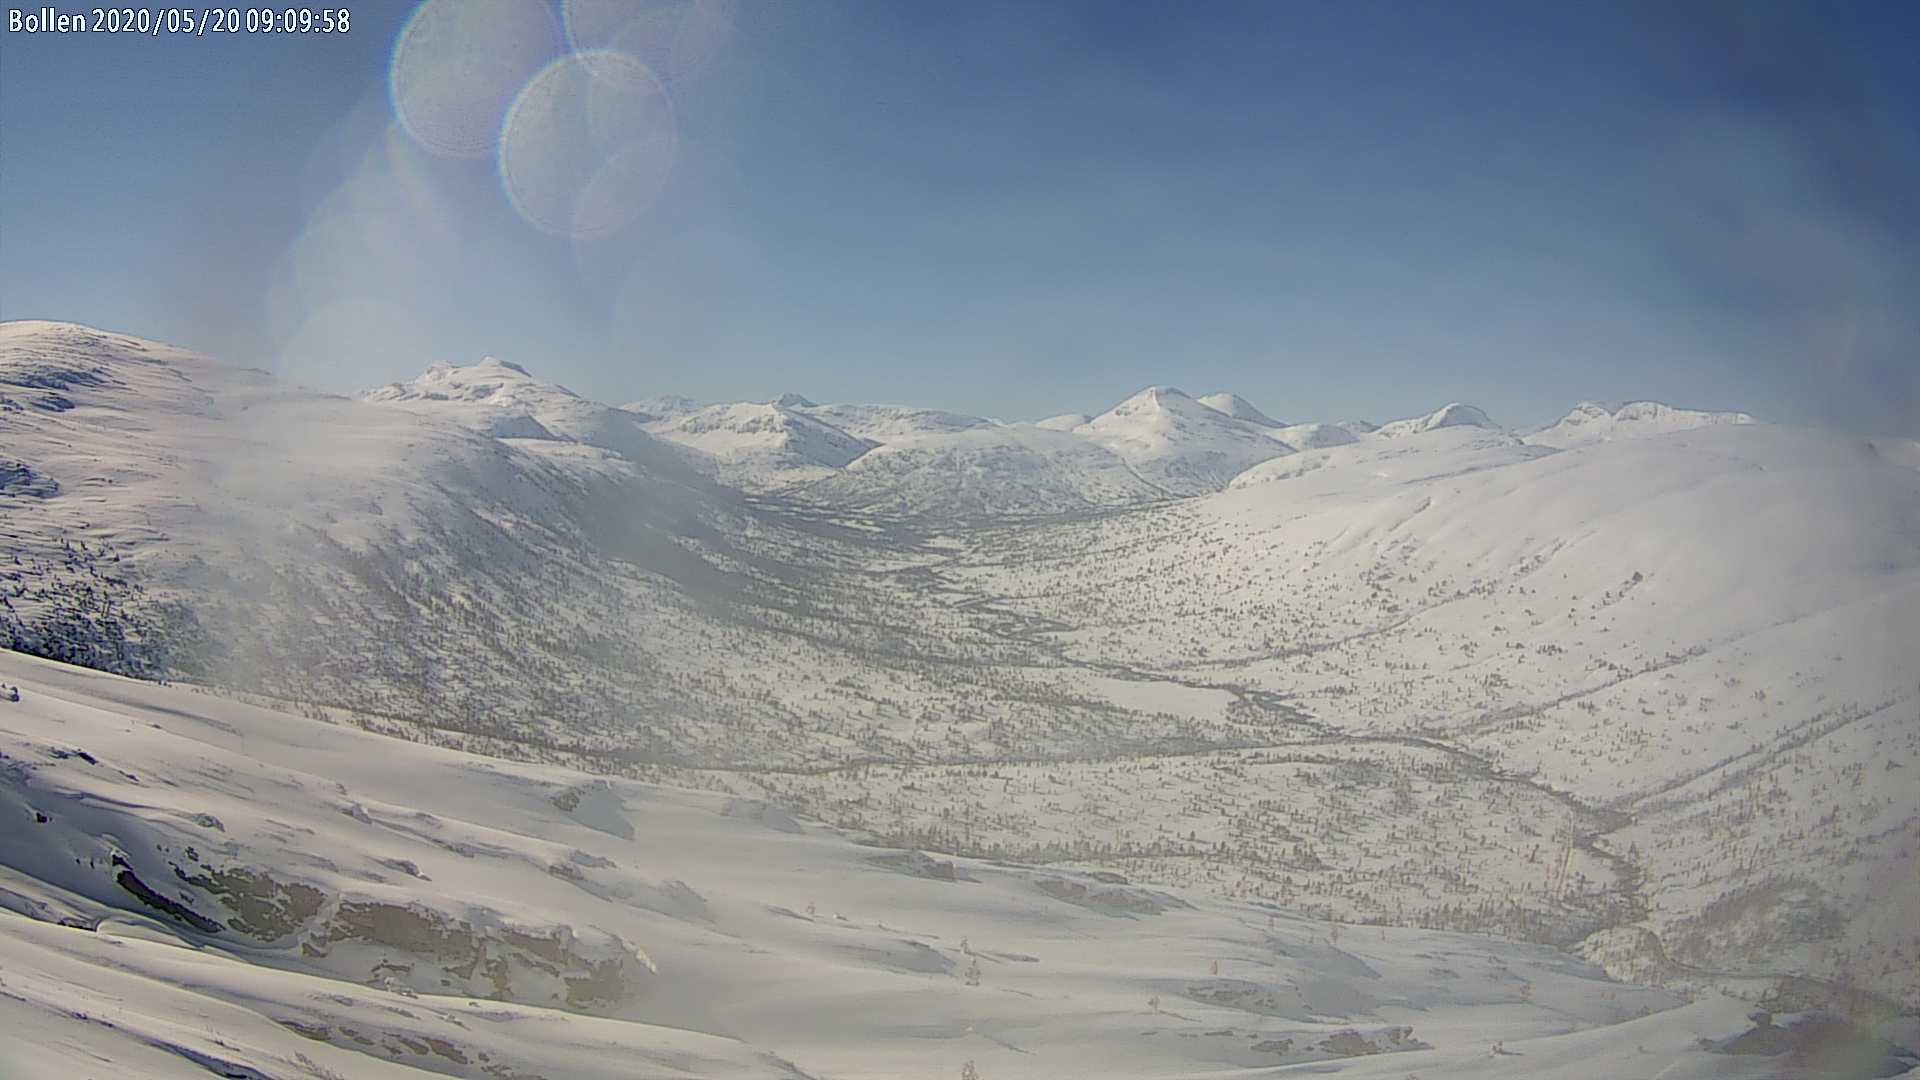 Innover Vindøldalen sett fra webkamera på Bollen